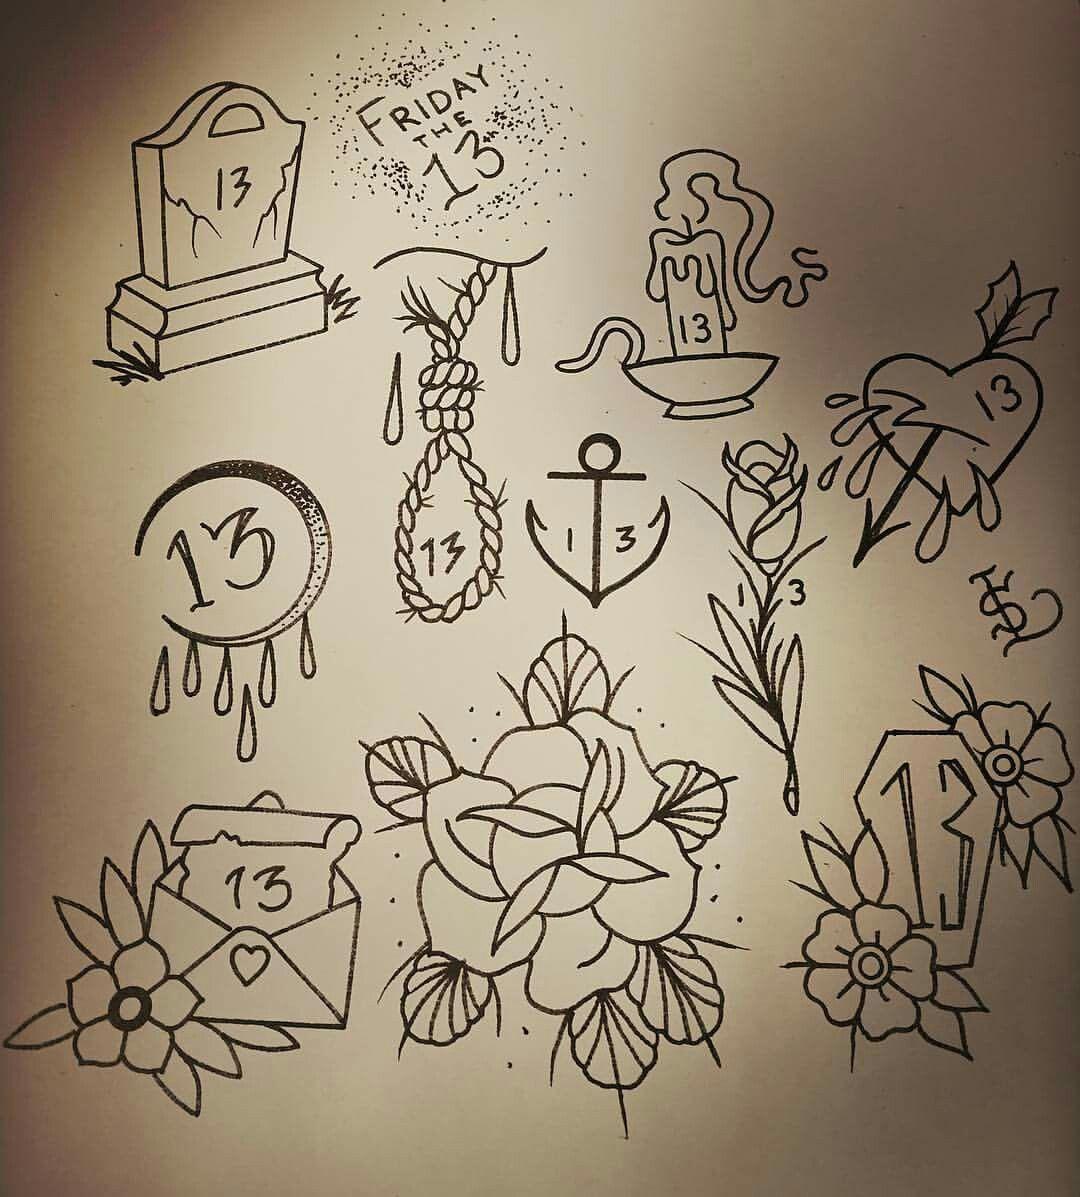 13 Tattoo Artists Share Some Of The Beautiful Flower: 13 Tattoos, Halloween Tattoos